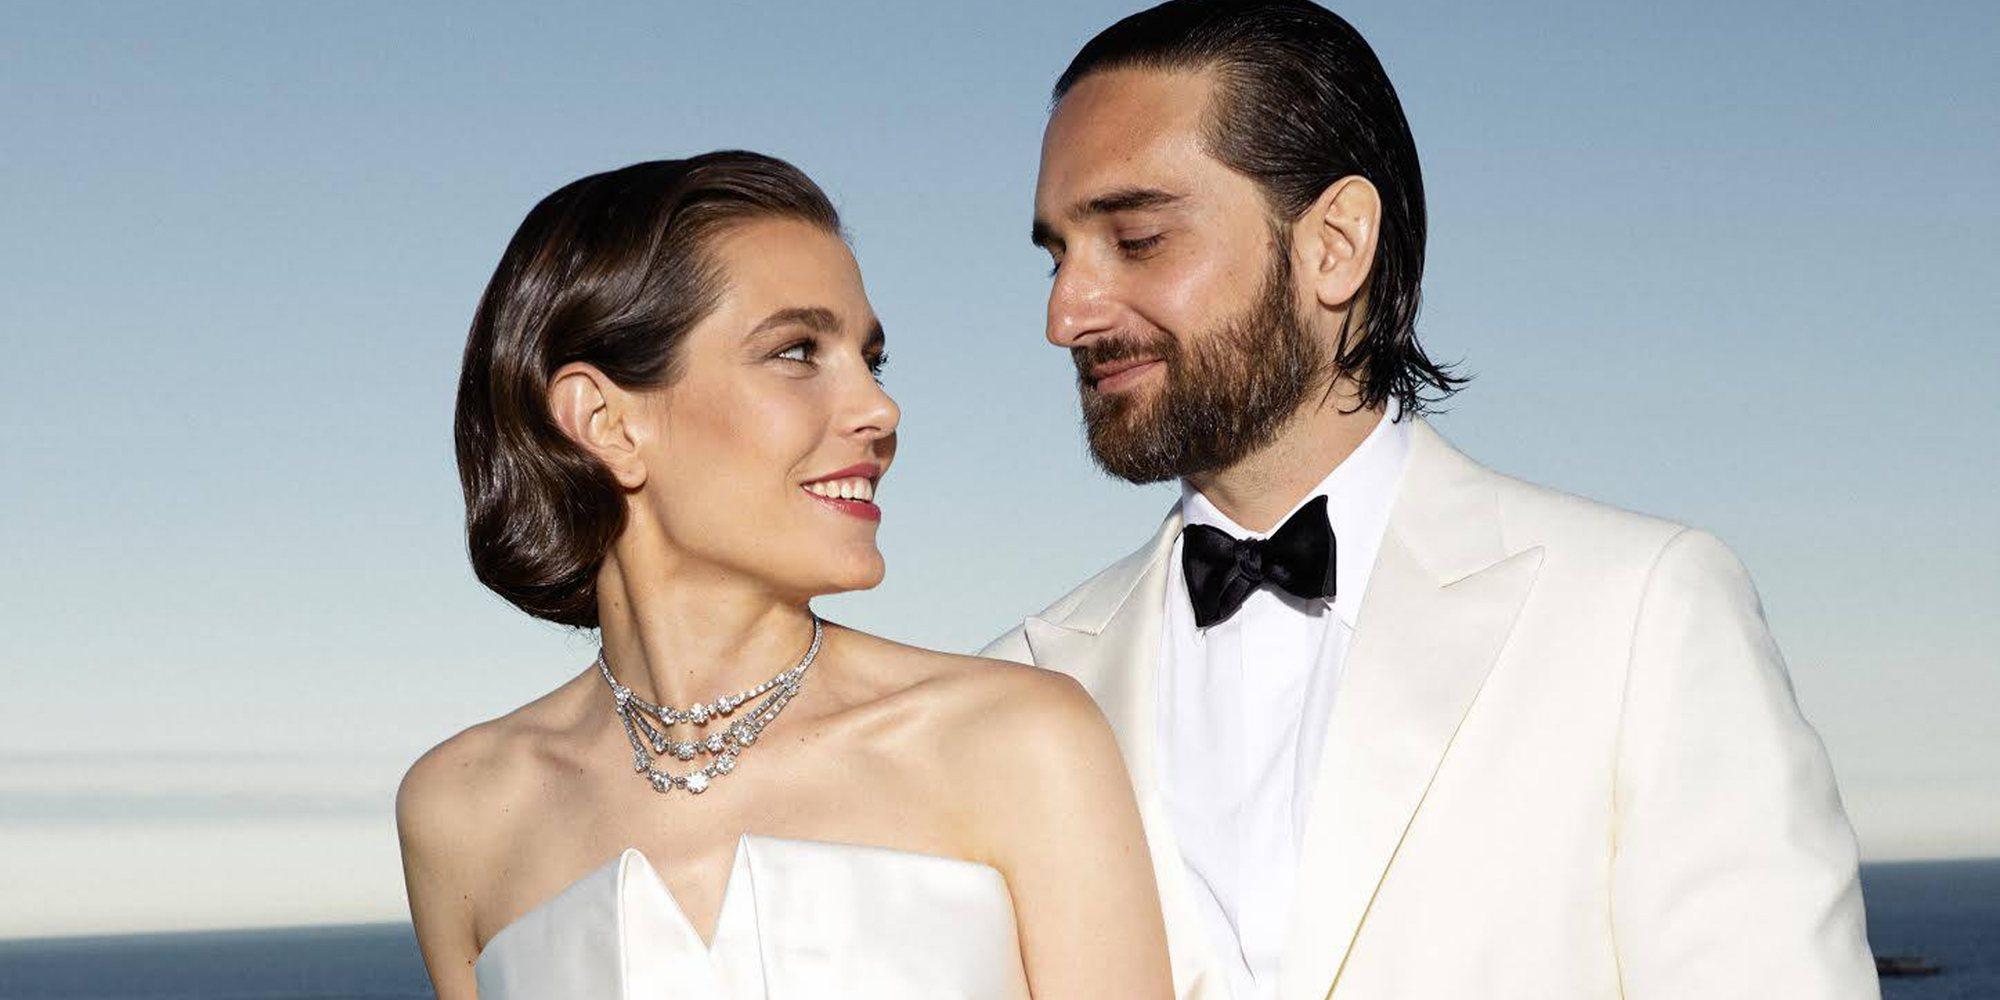 La boda poco tradicional de Carlota Casiraghi y Dimitri Rassam